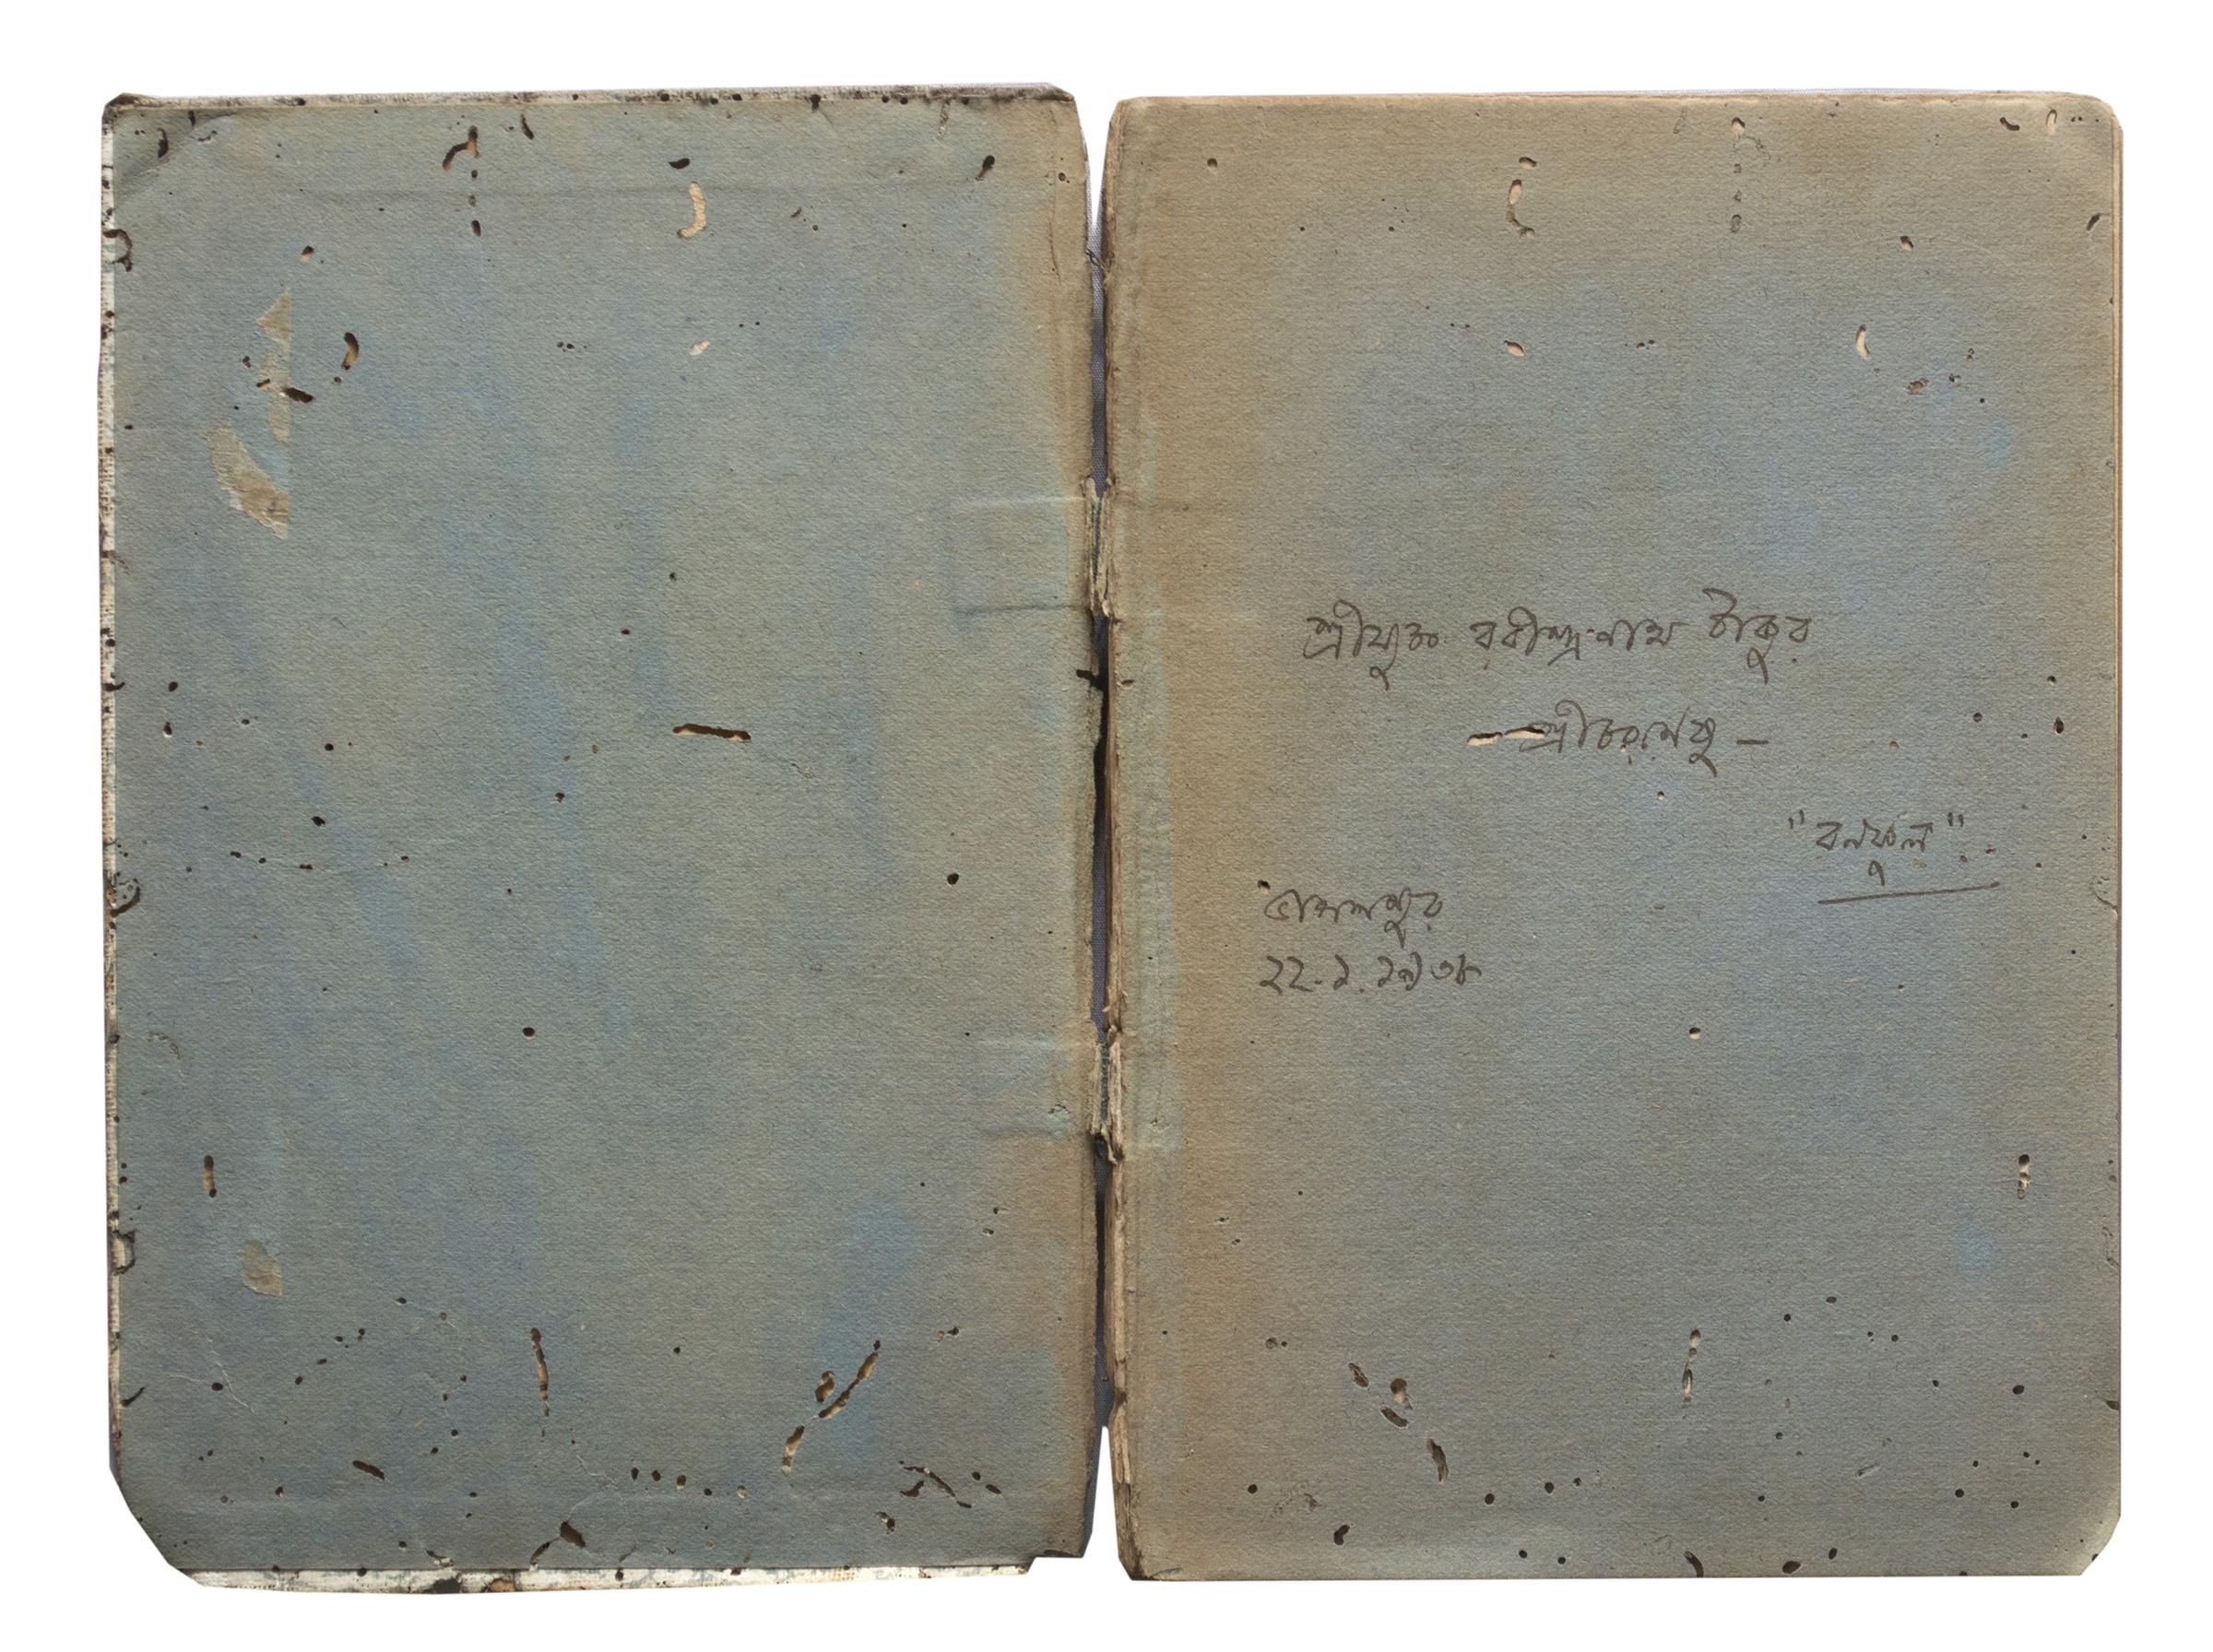 Kichhukhon (novel in Bengali) by Bonophool